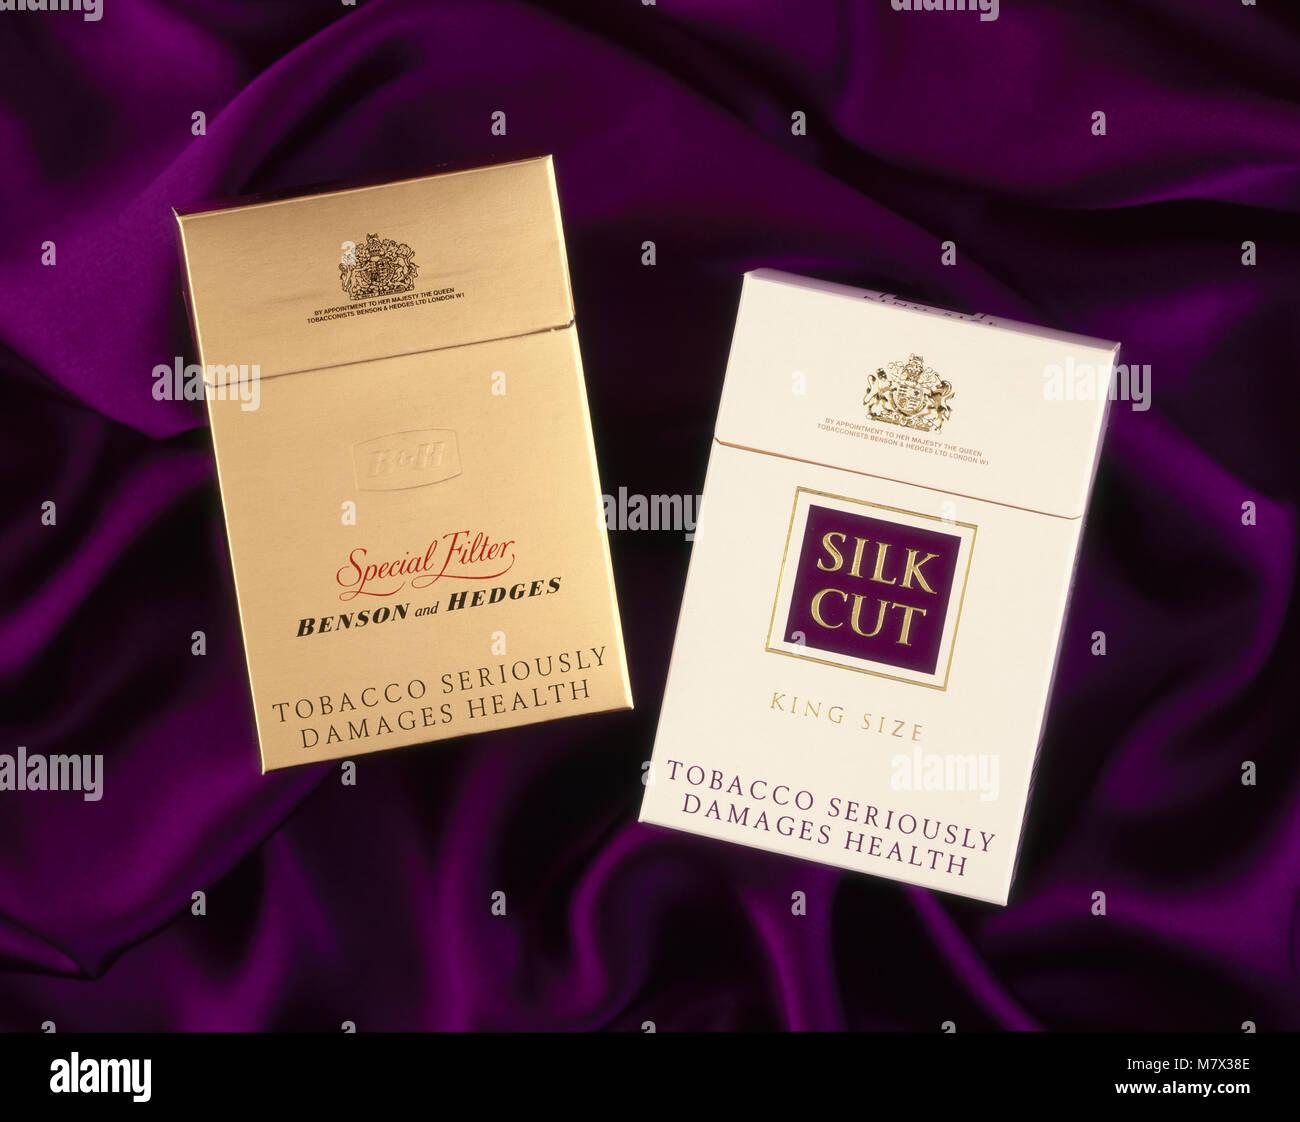 Silk cut cigarettes purple what do cuban cigars cost